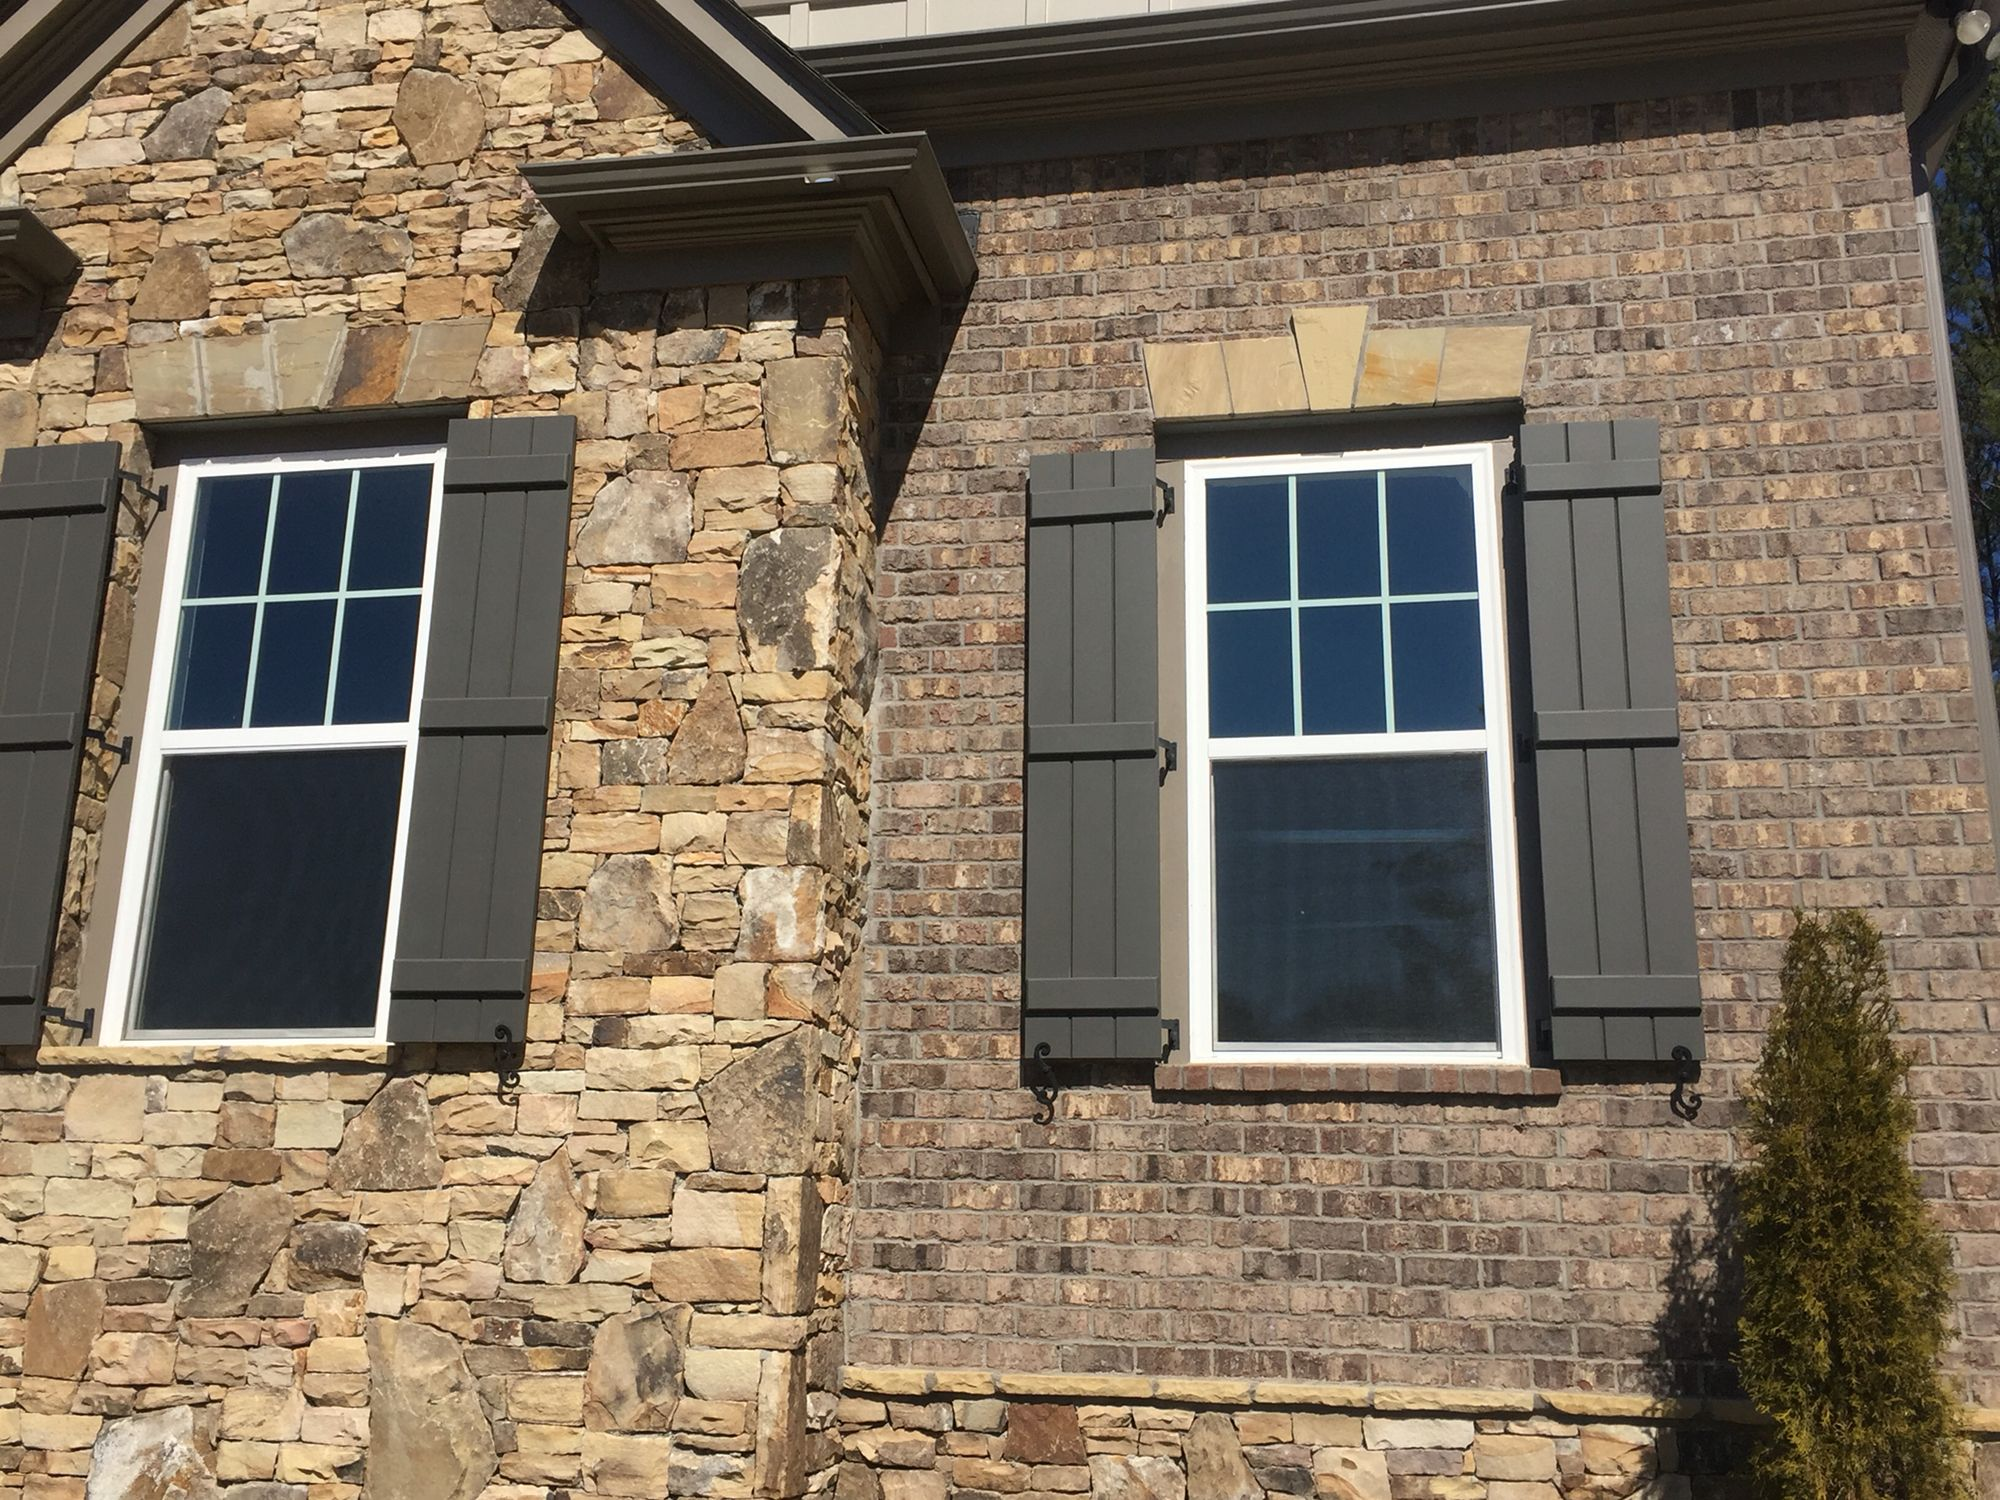 Marshton brick Mortar - Coosa gray